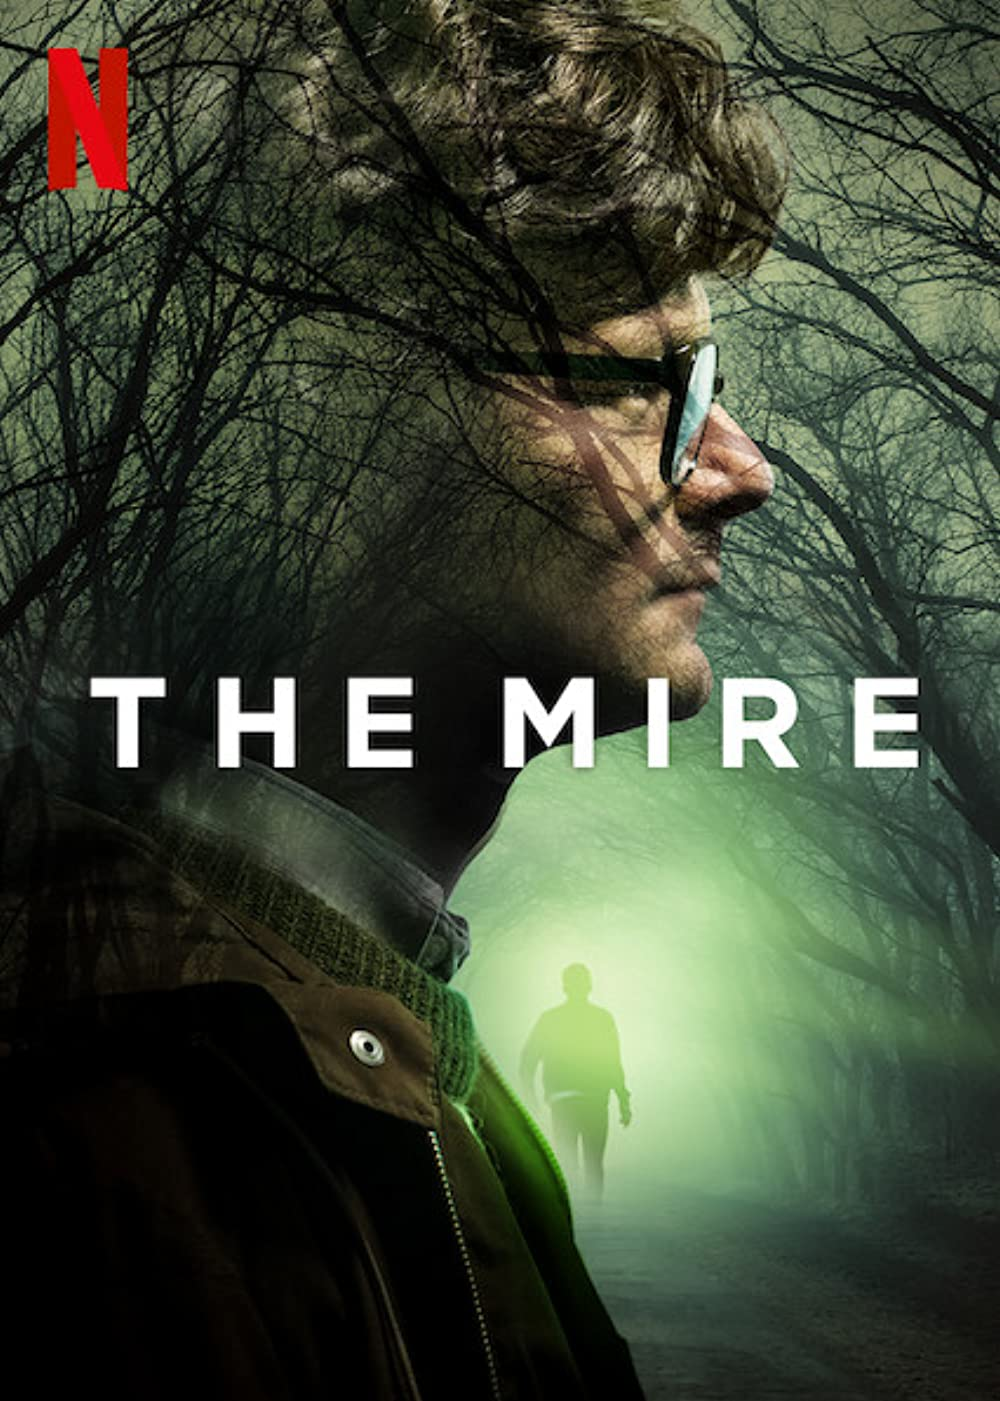 Vũng Lầy (Phần 2) - The Mire (Rojst) (Season 2)